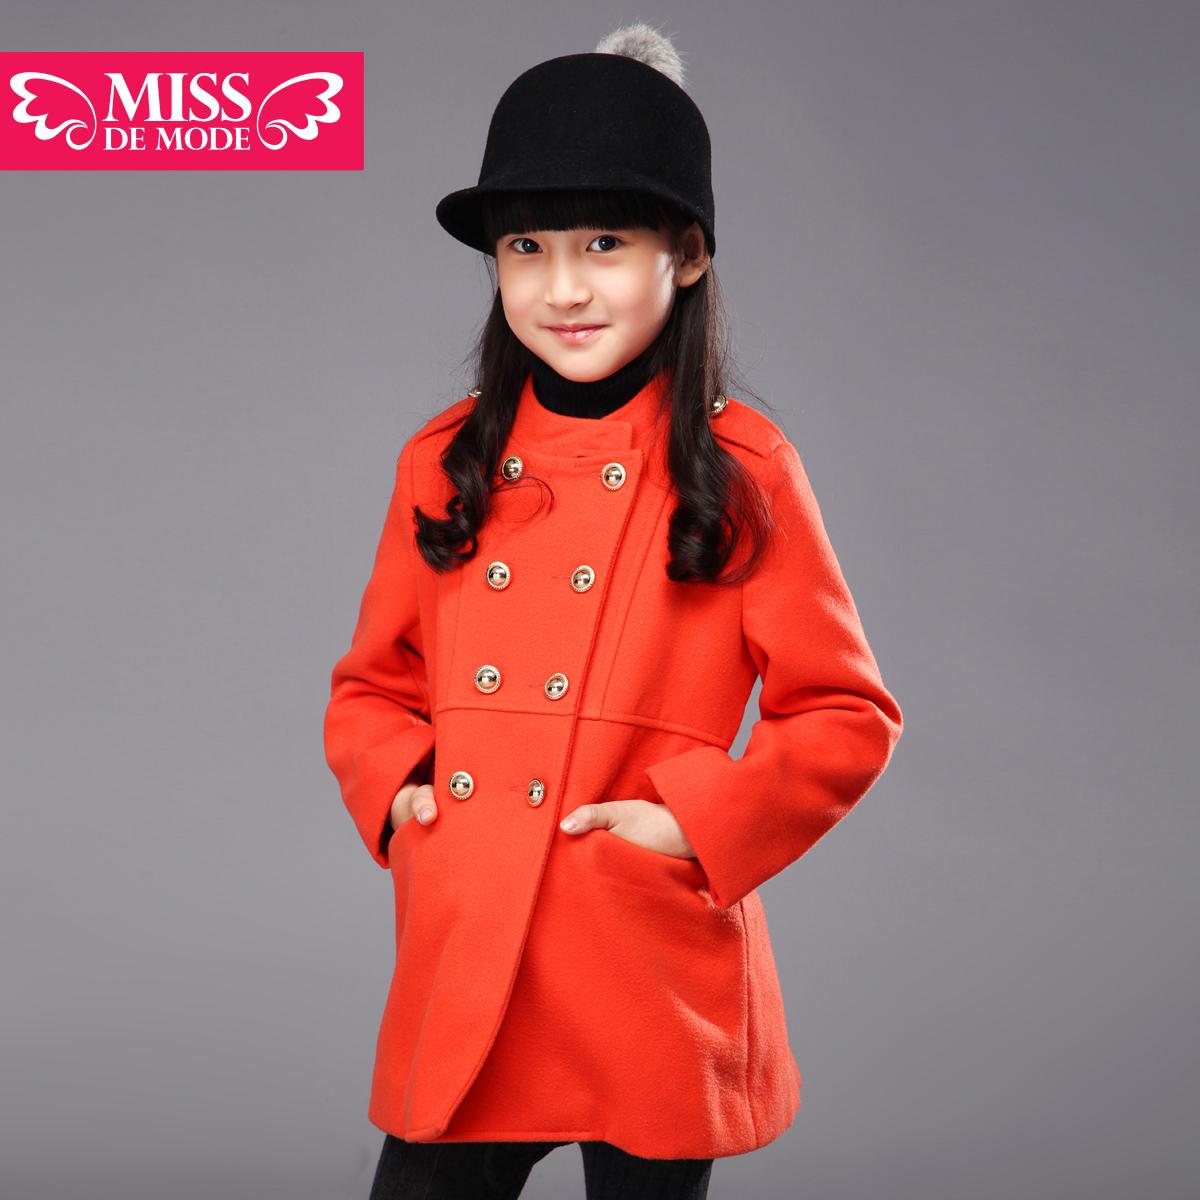 Пальто детское Miss de mode qd310077 2013